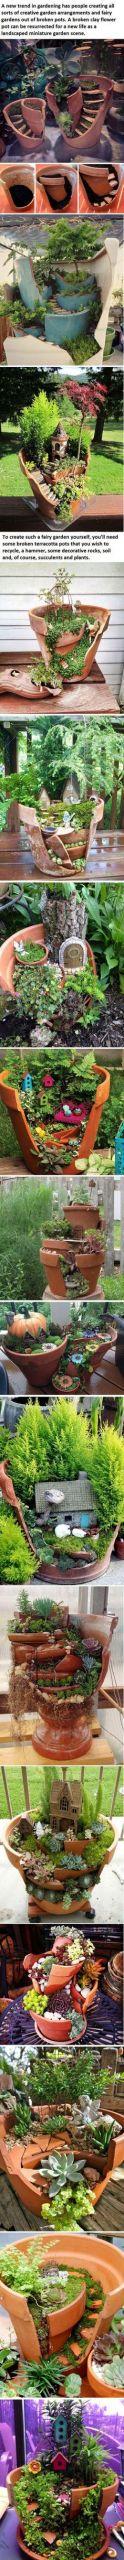 9232aa e2b8aac1522d2ad0 mini gardens miniature gardens